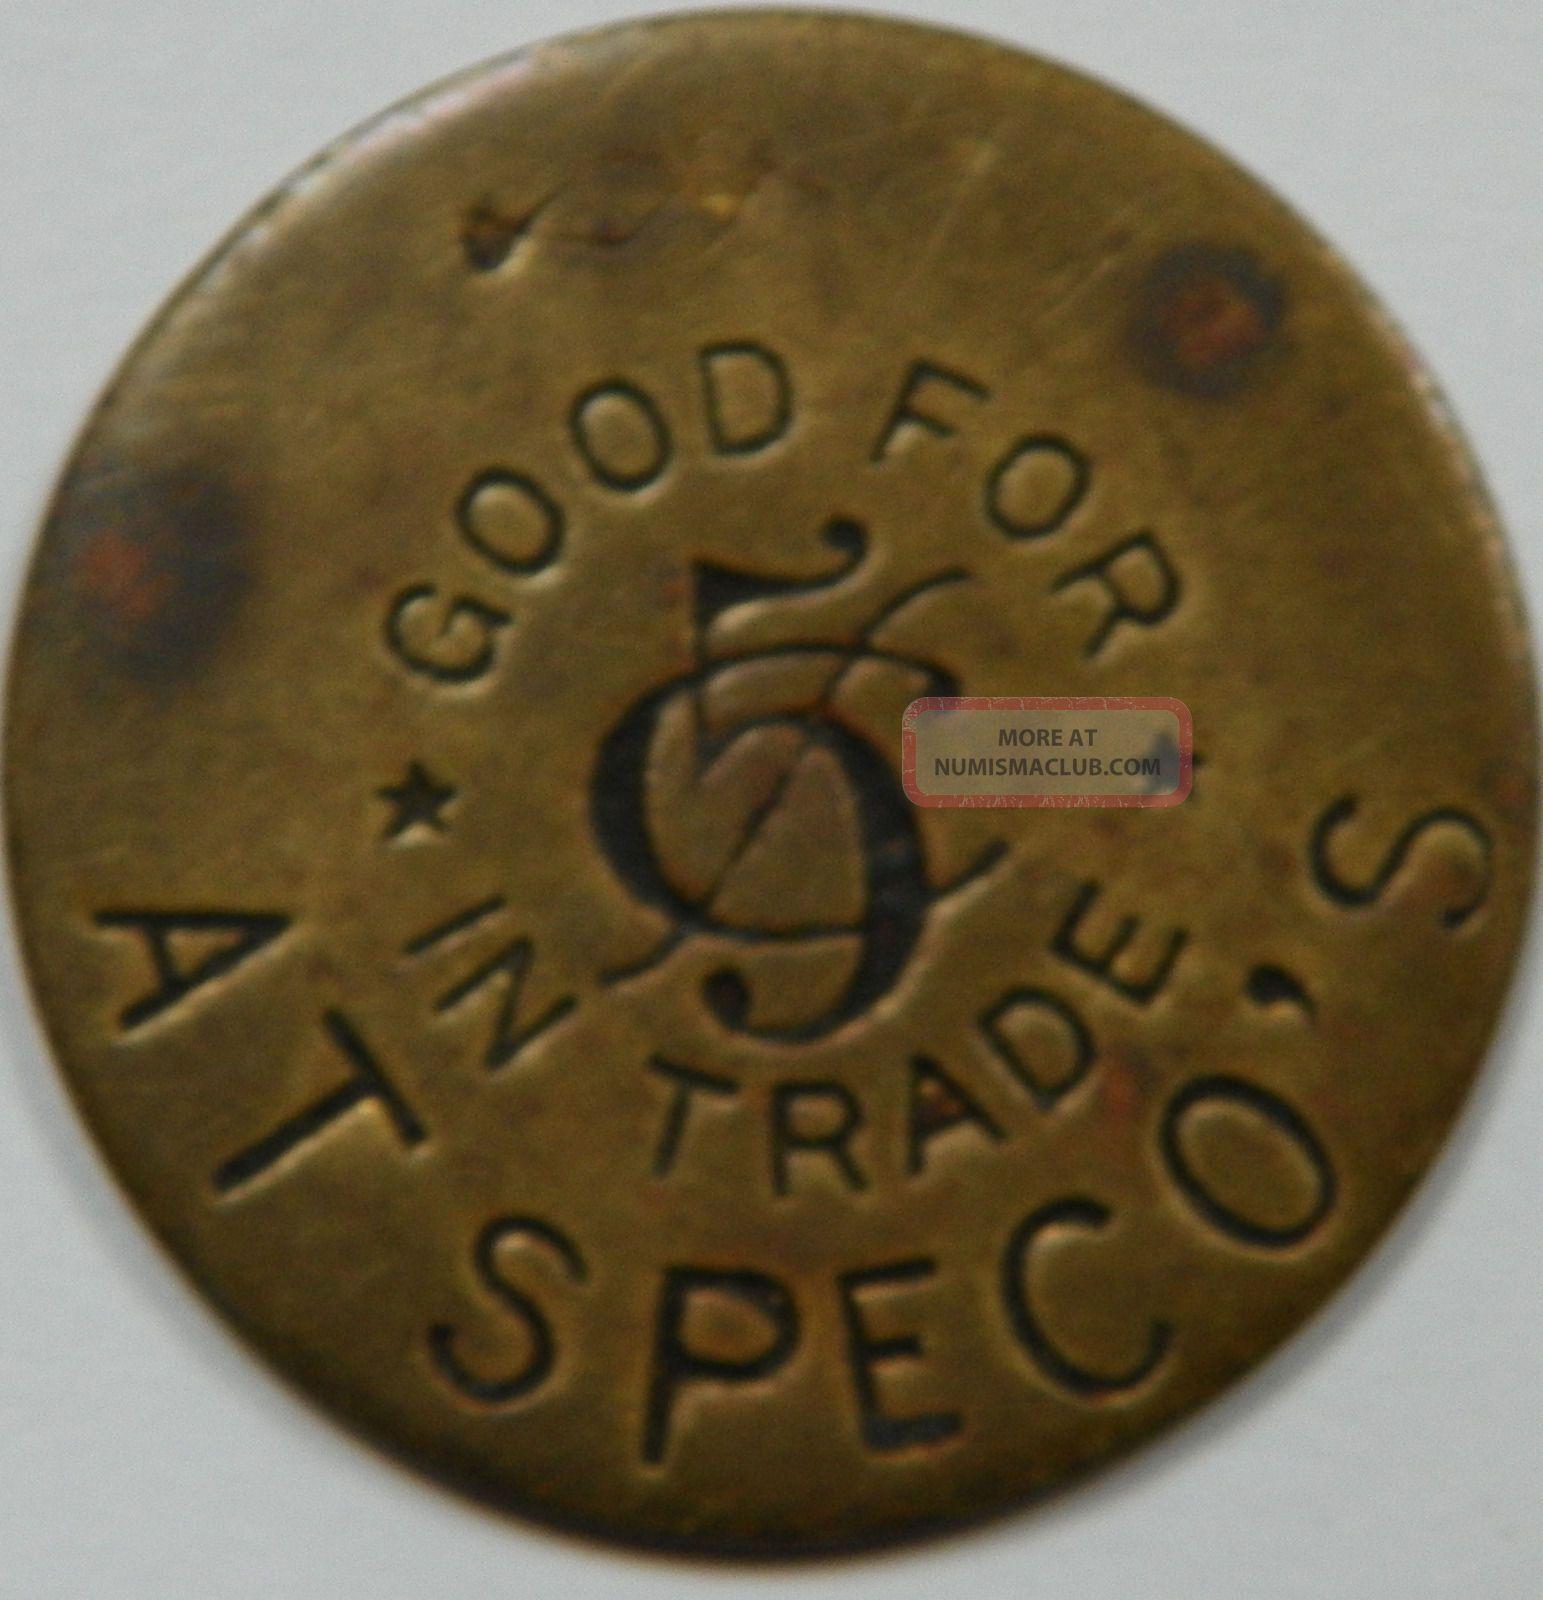 Speco ' S 5 Cent Good For Trade Token Rochester Hampshire Cigars Billiards Exonumia photo